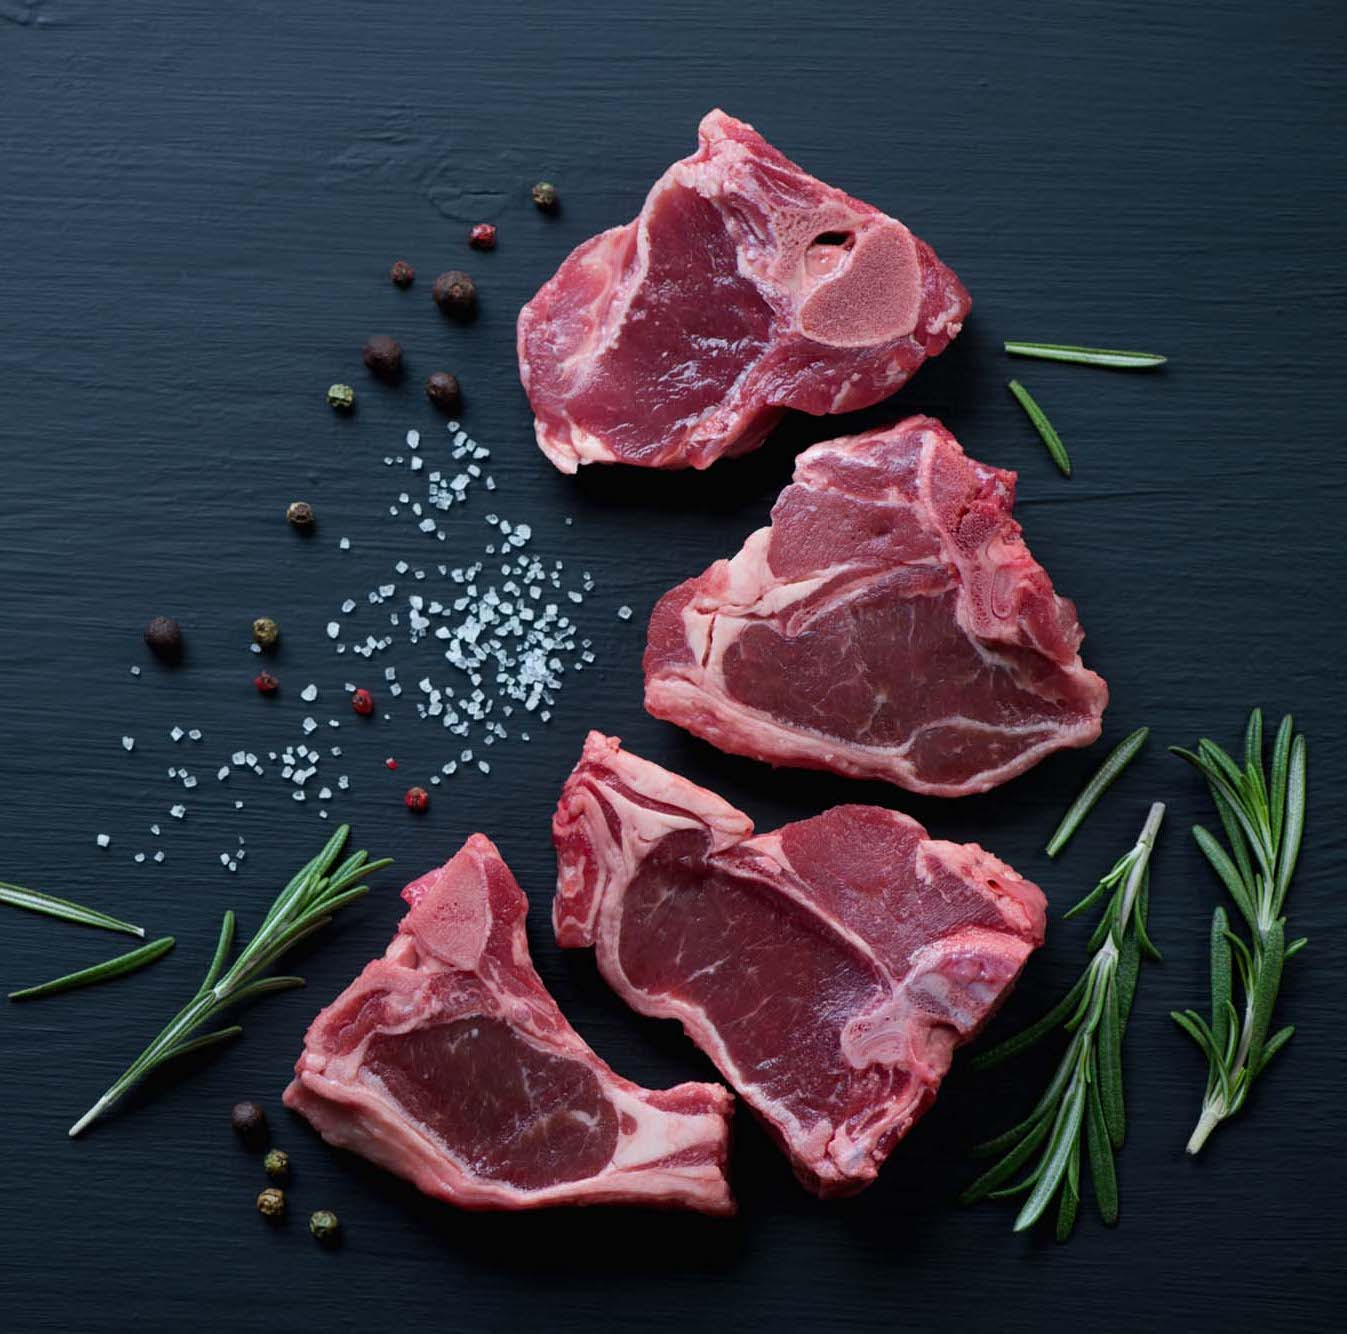 Raw,T-bone,Lamb,Steaks,With,Seasonings,On,A,Black,Wooden